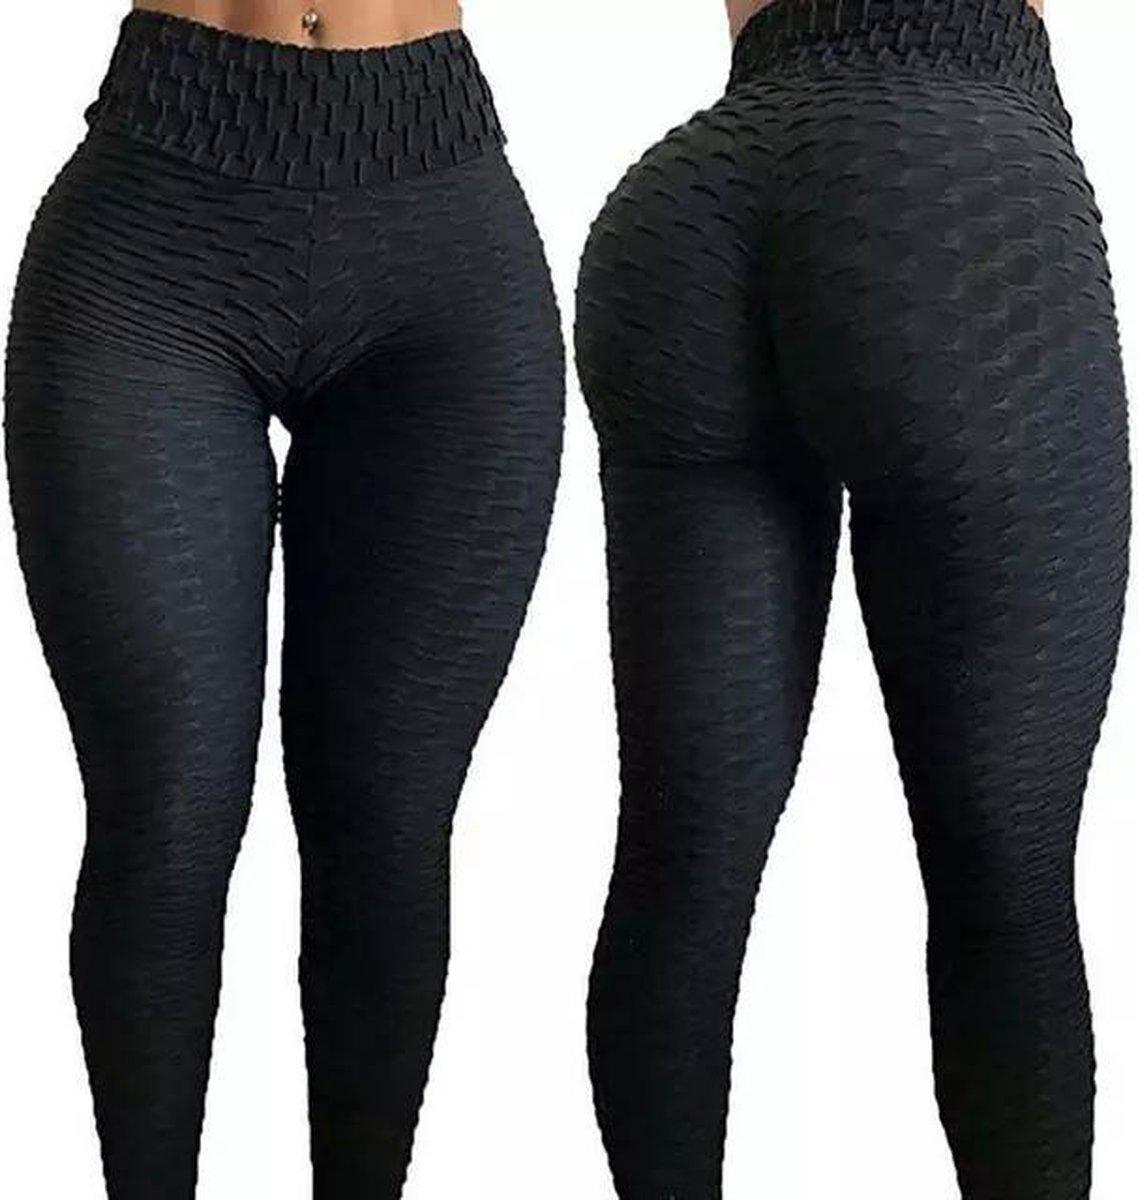 Sportlegging-Yoga -Scrunch Butt-High Waist- Absorberend- Anti Cellulite Legging-Gym Sports -Legging